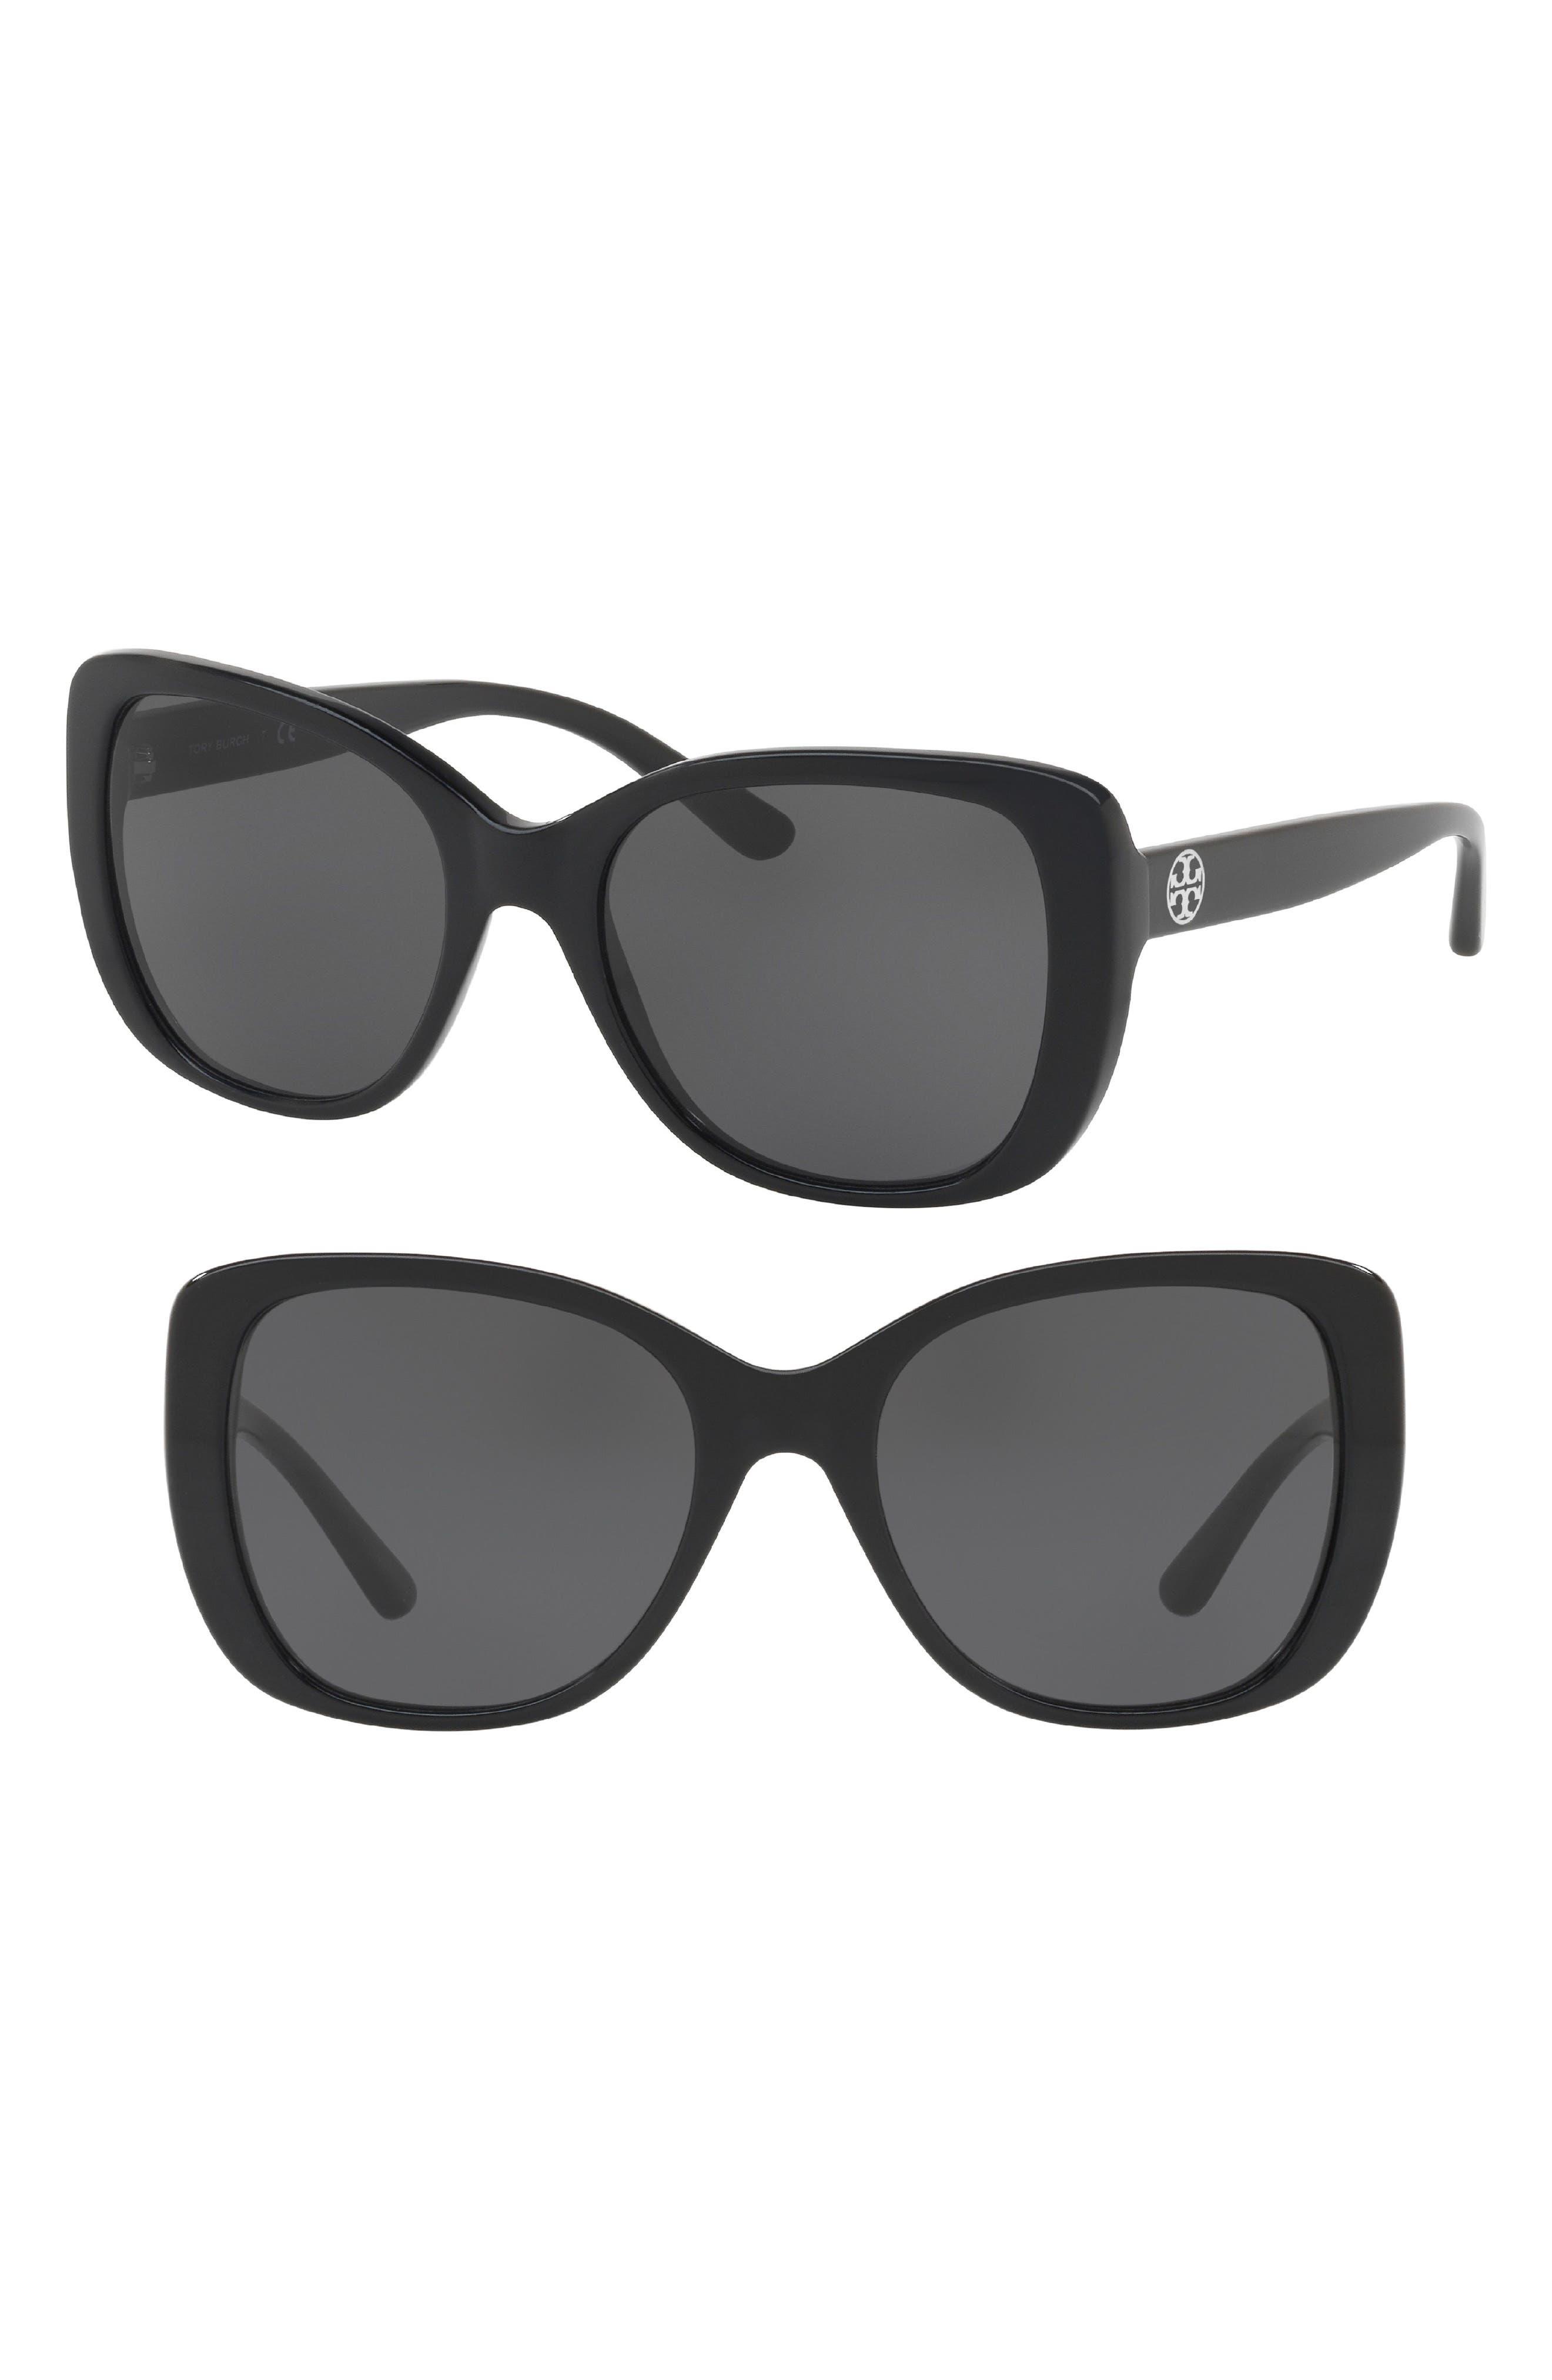 TORY BURCH, 53mm Rectangle Sunglasses, Main thumbnail 1, color, BLACK